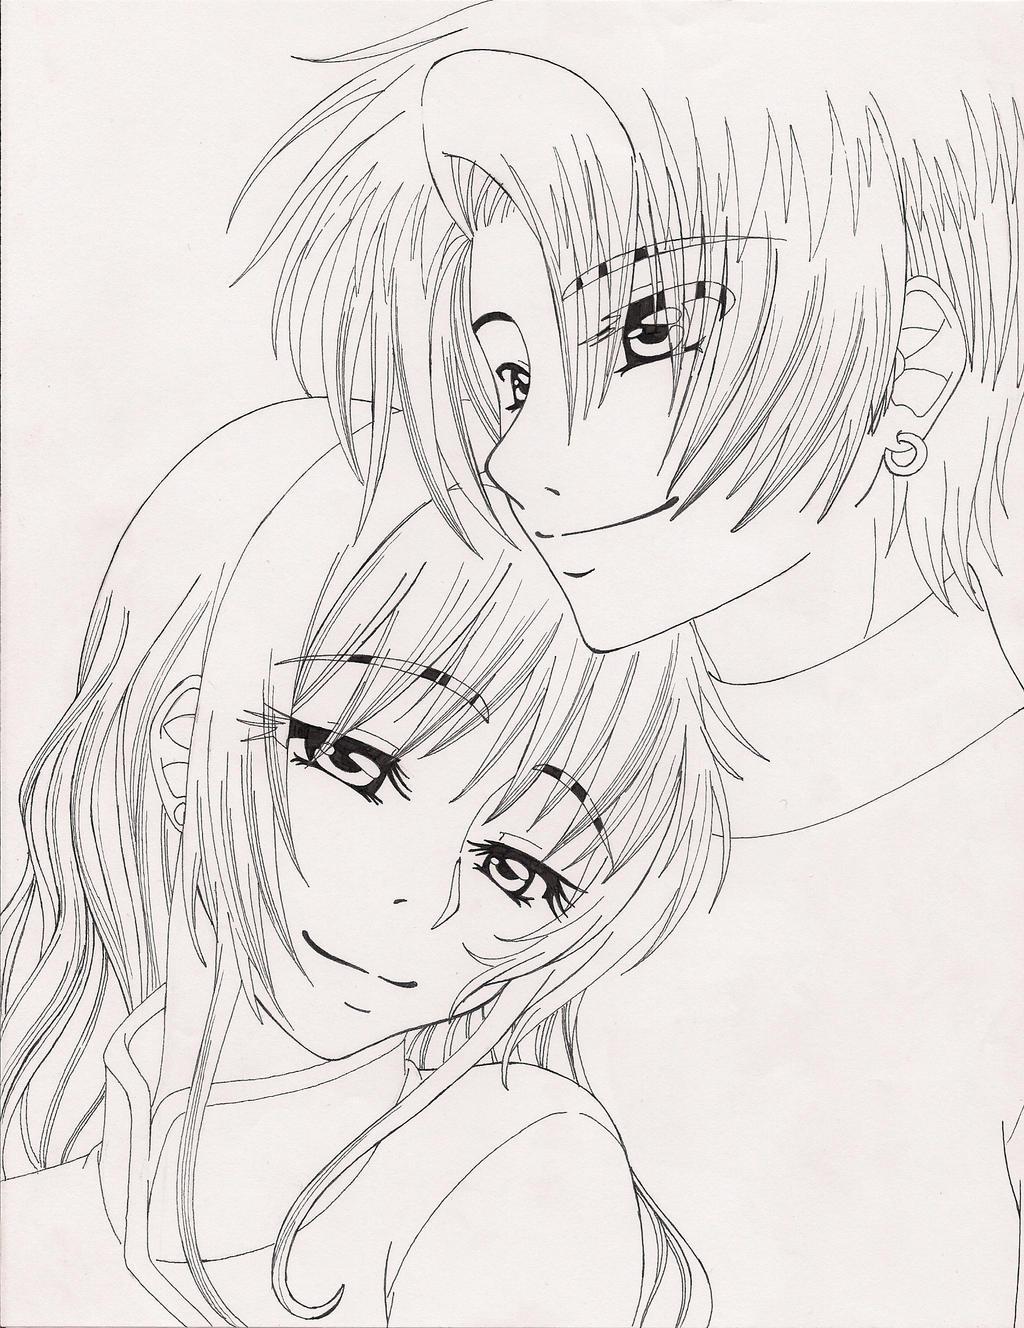 Line Art Love Images : I will love you always line art by koyukitorigirl on